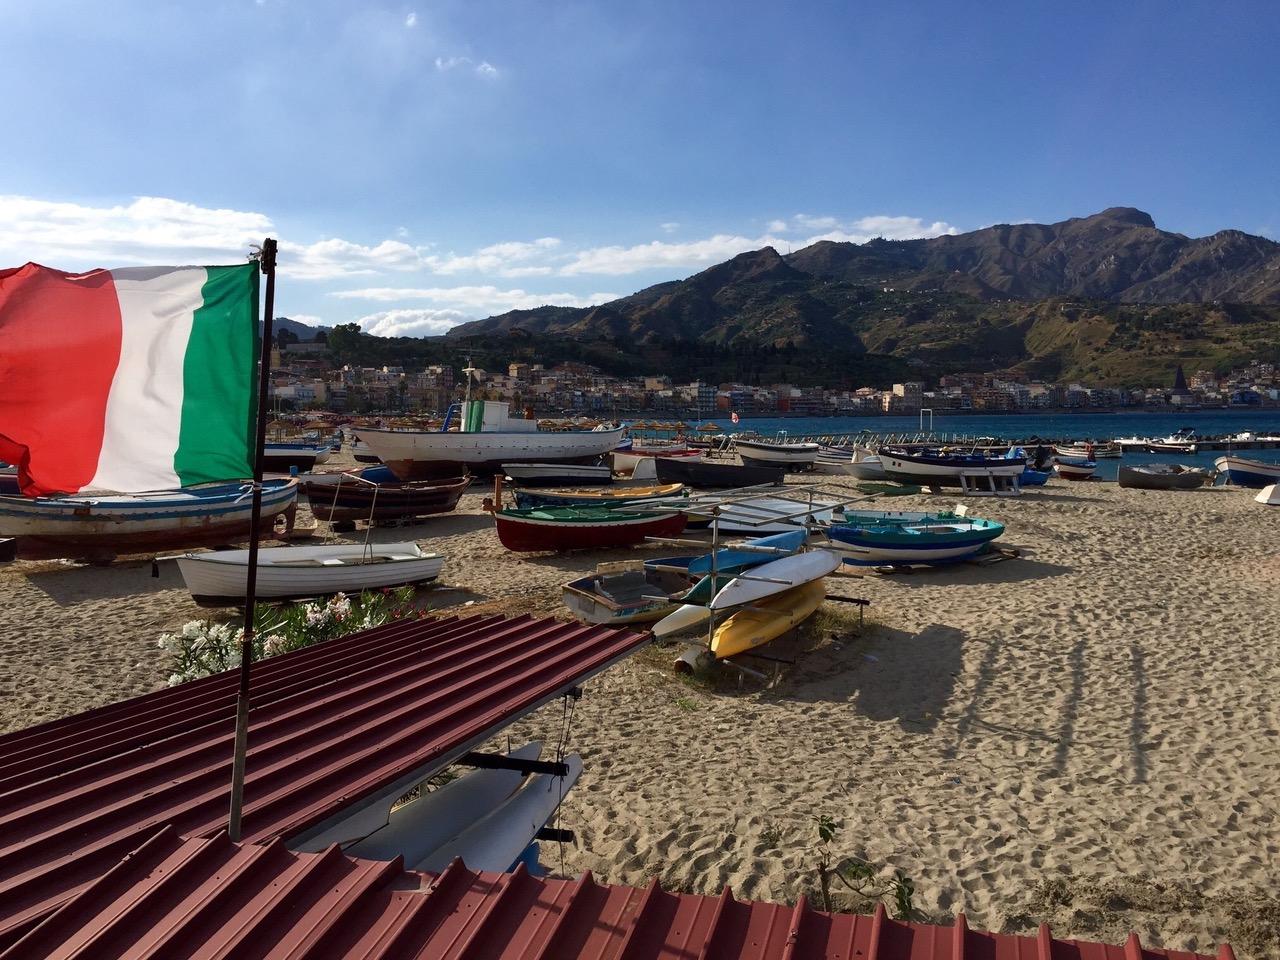 Beach with fishing boats at Giardini Naxos, Sicily